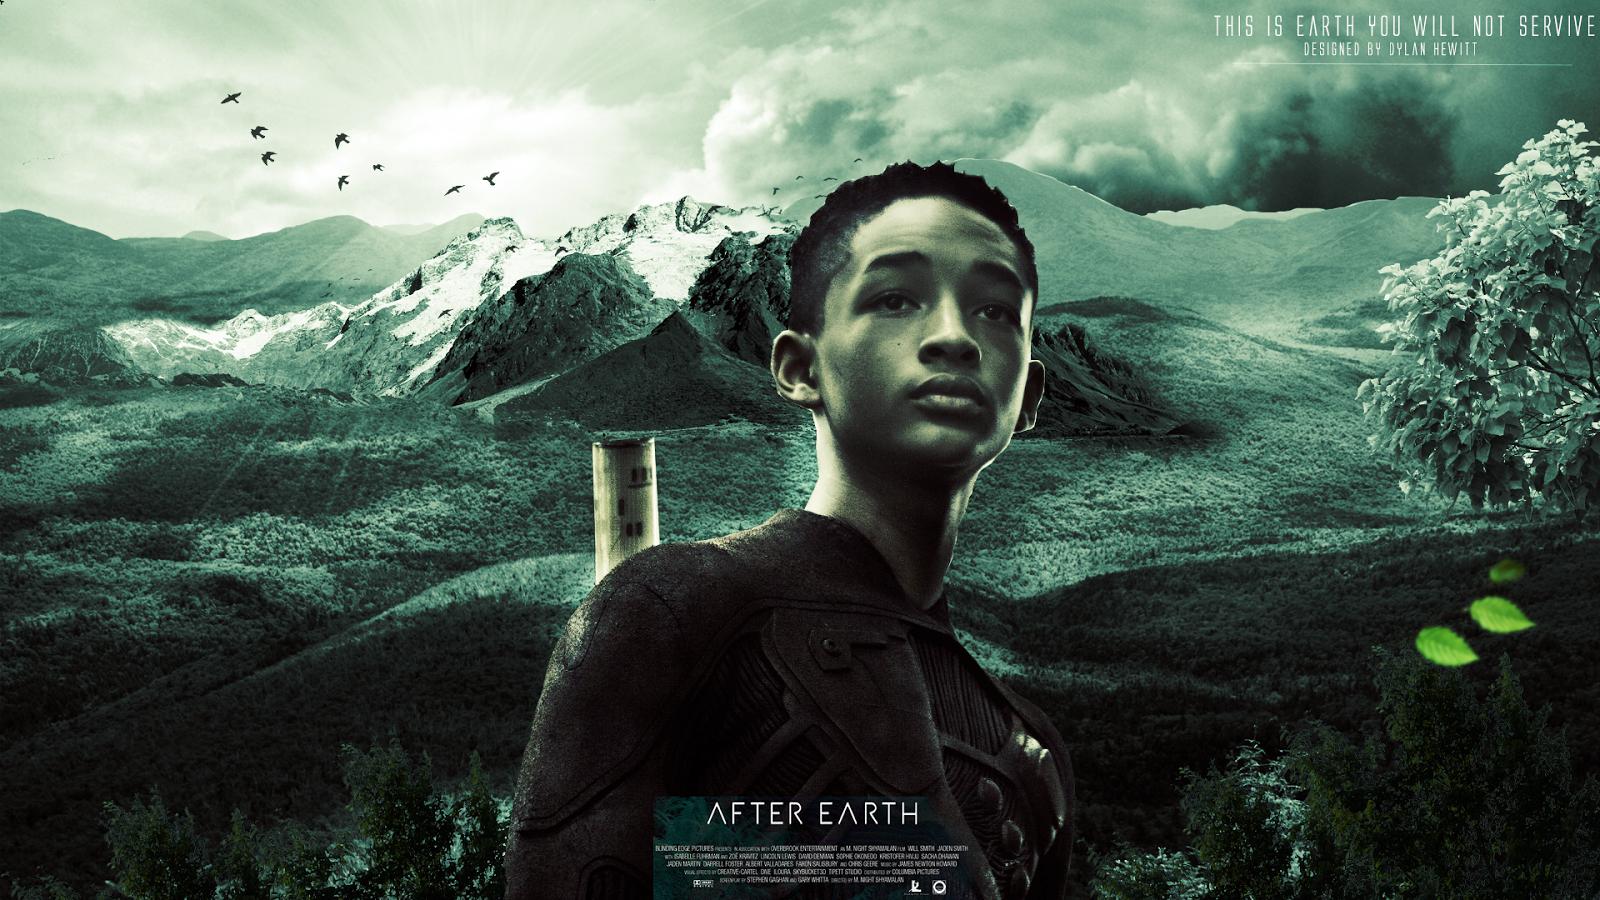 Wallpapers HD: After Earth Wallpapers HD Varios de la pelicula 2013 (25)